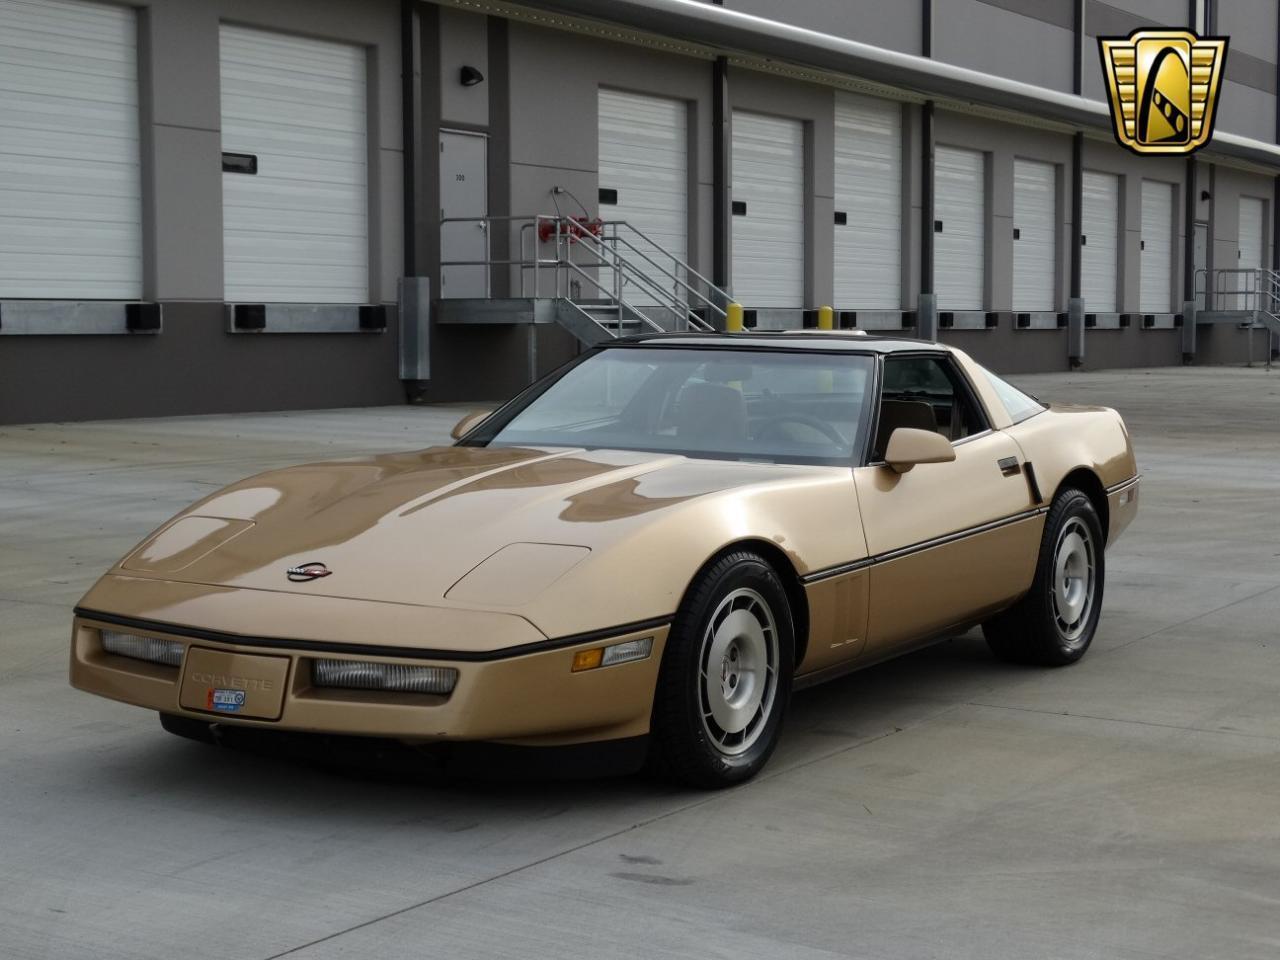 Large Picture of '86 Chevrolet Corvette - $11,595.00 - KF5W